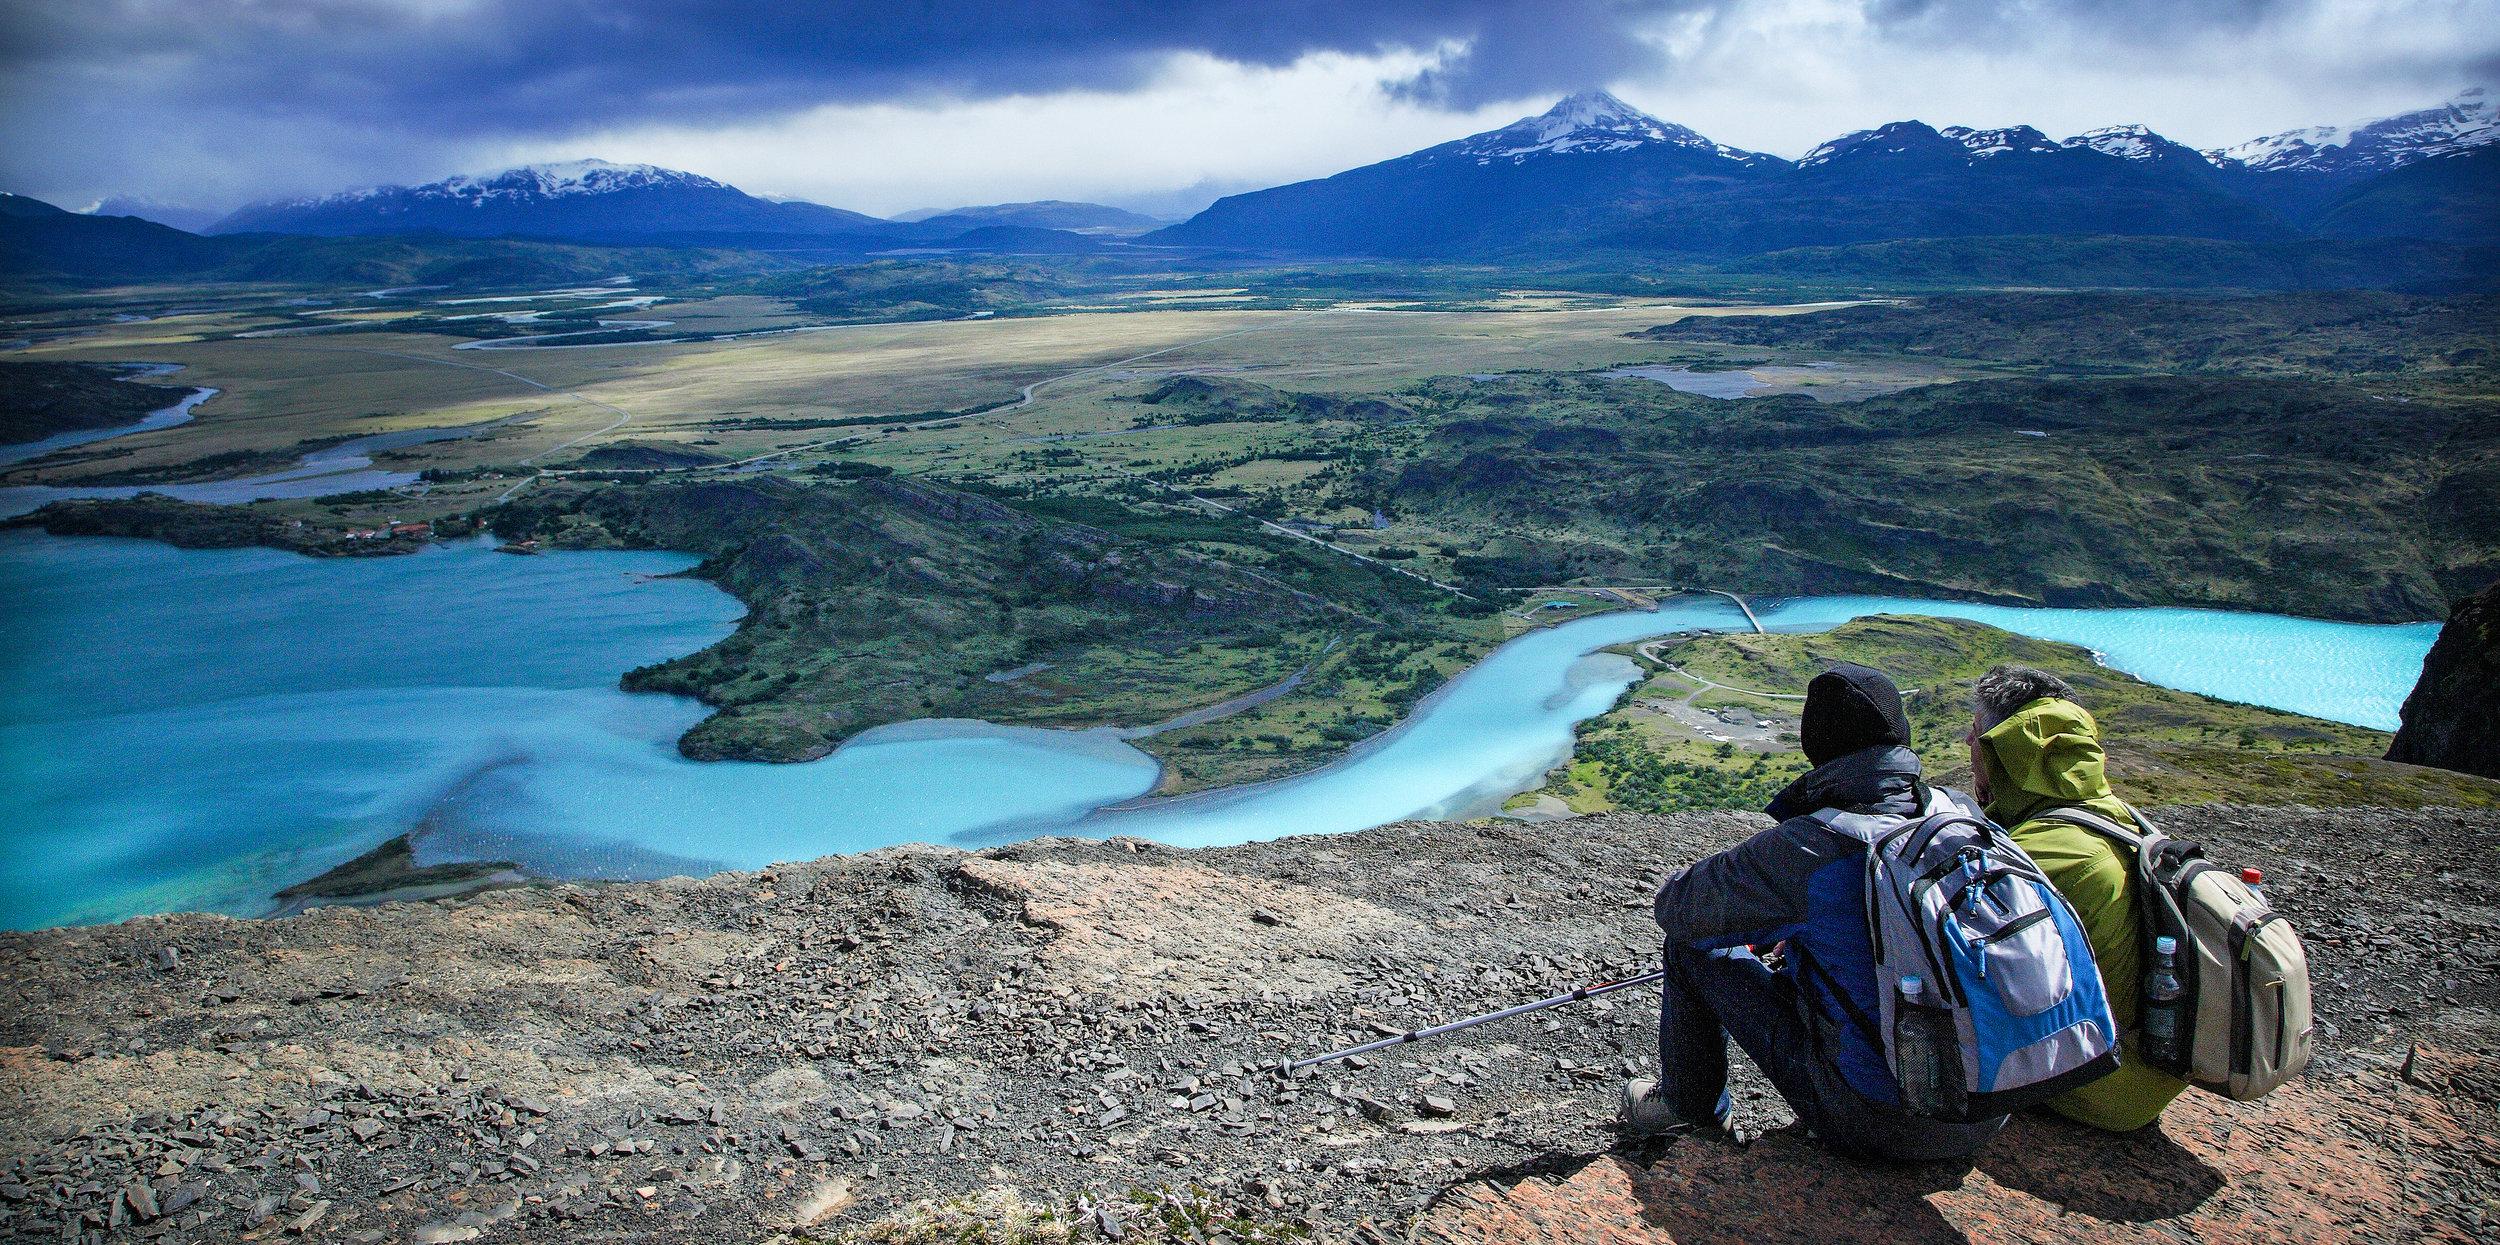 Trekking excursions with Hotel Las Torres, Patagonia